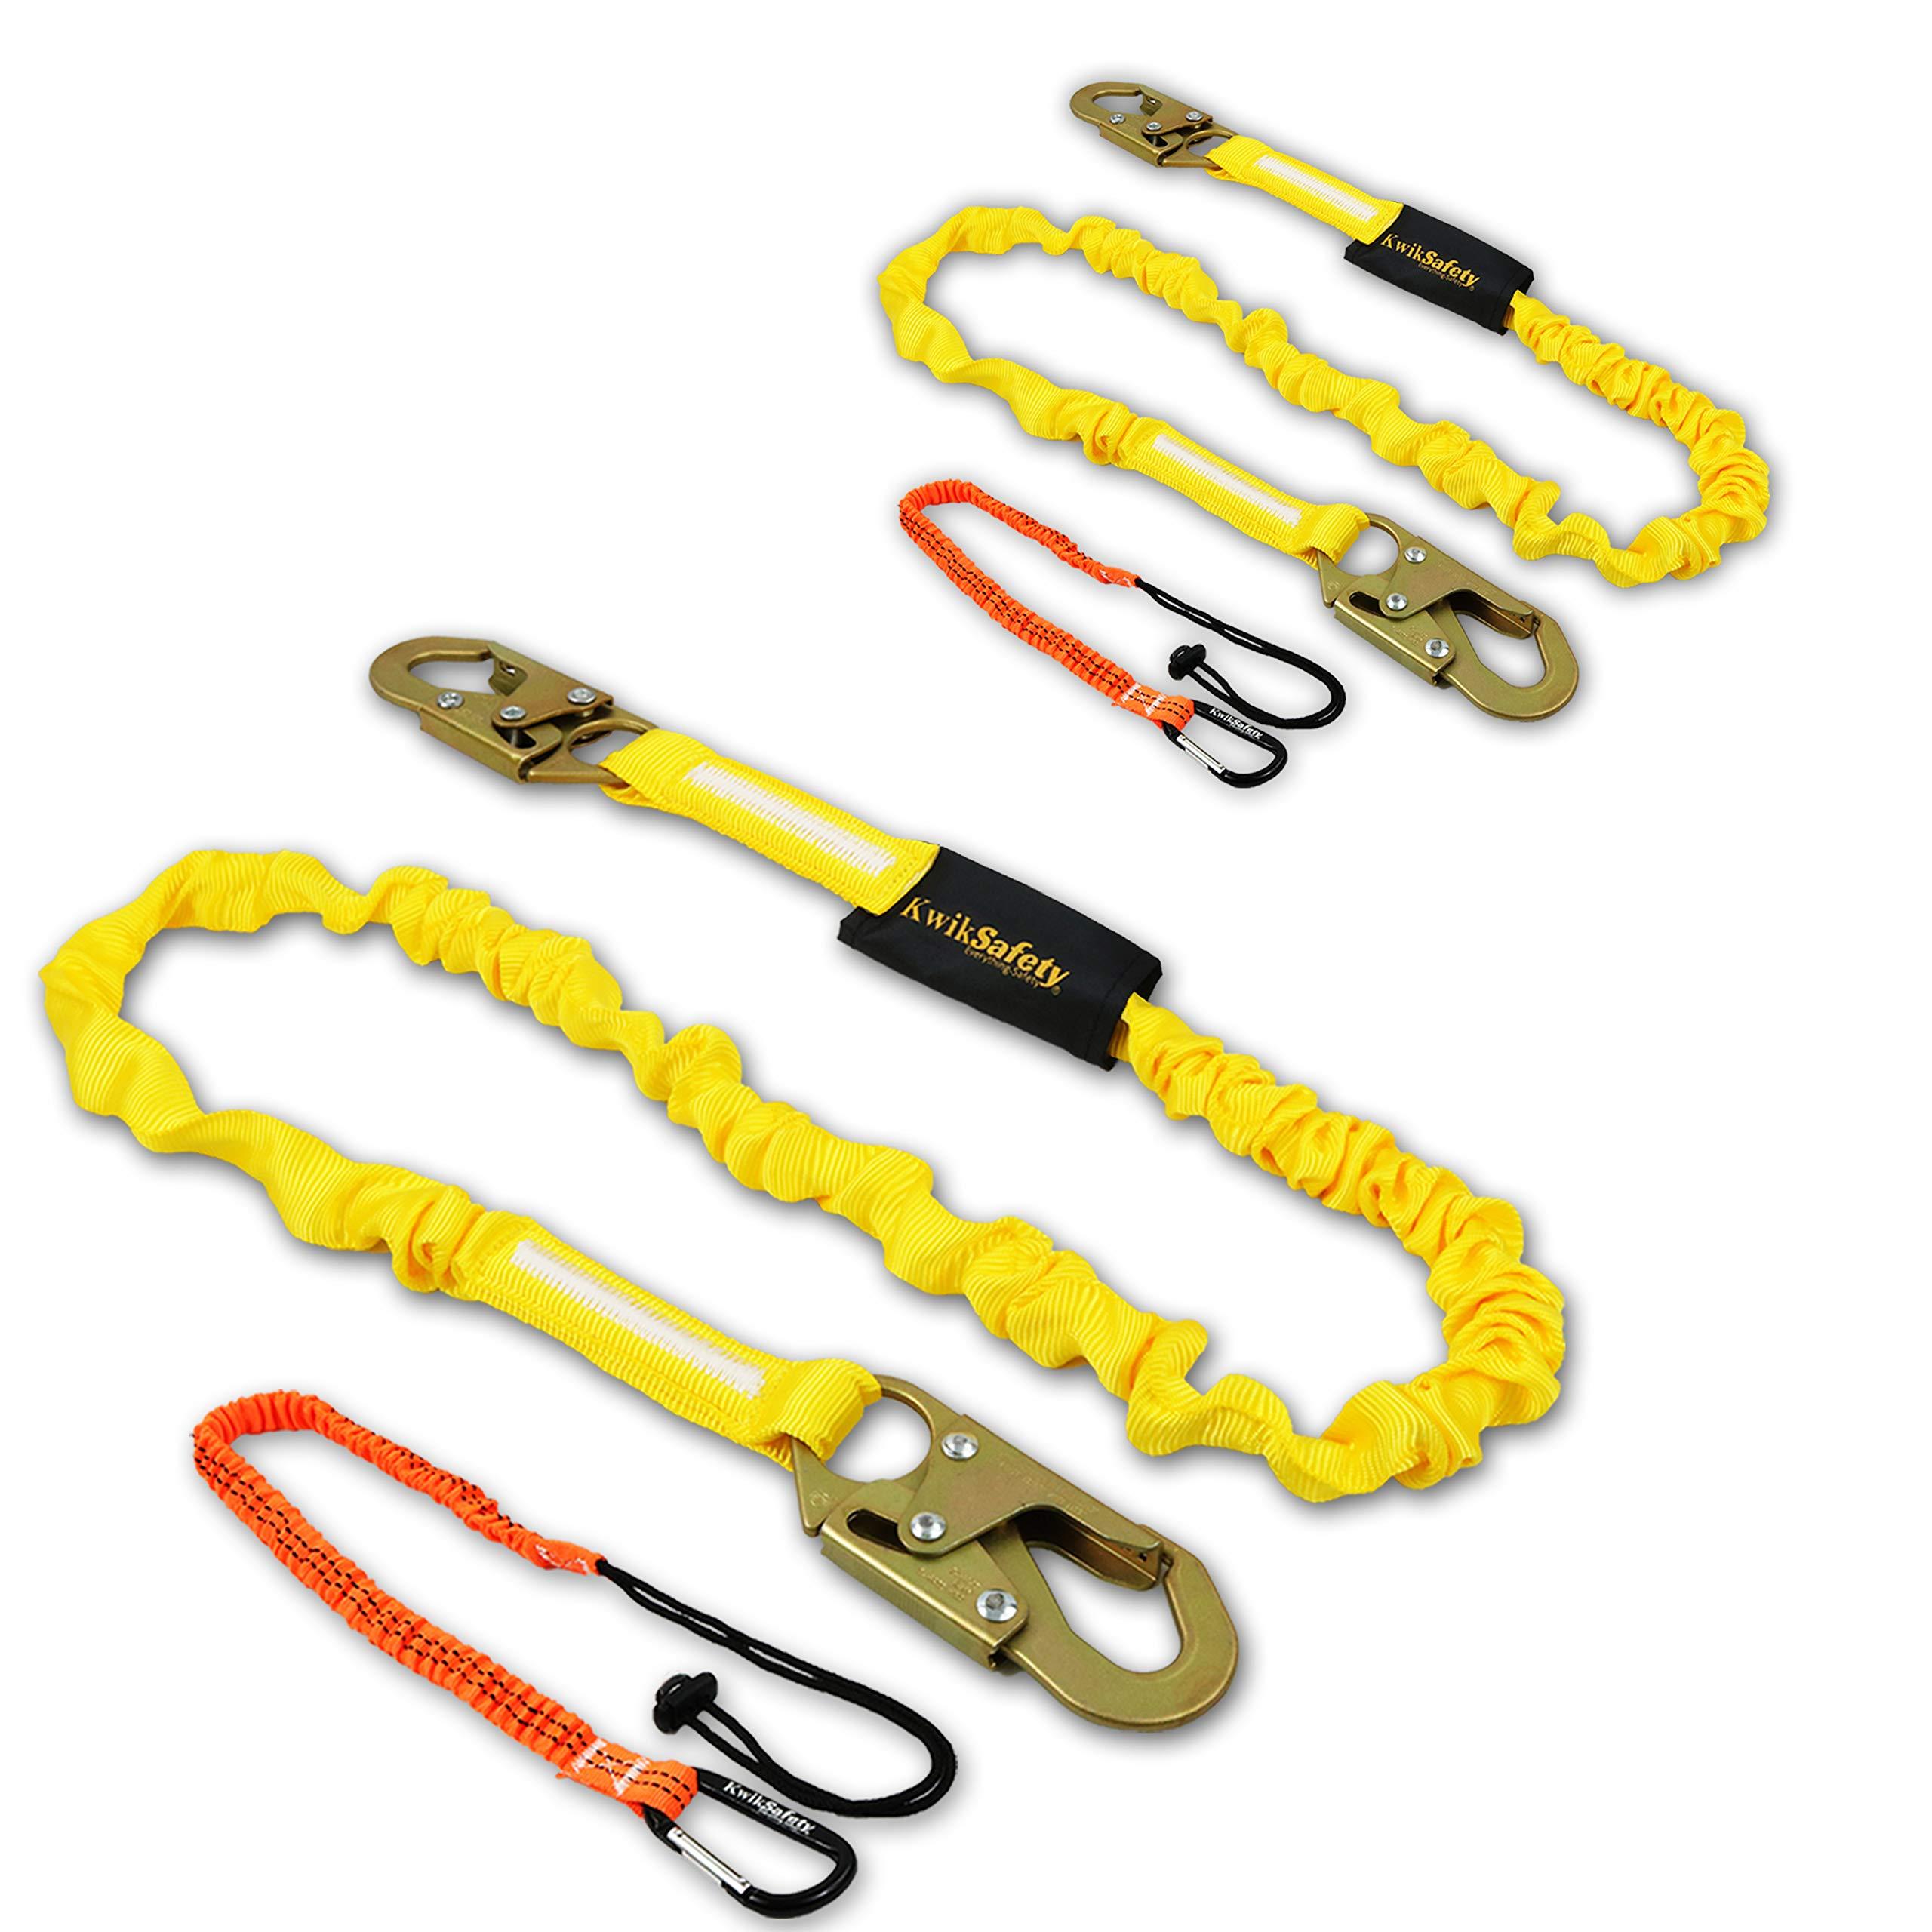 KwikSafety (Charlotte, NC) RATTLER (2 PACK) 6ft Tubular Safety Lanyard, Tool Lanyard | ANSI OSHA Single Leg Non Stretch Shock Absorbing Lanyard Snap Hooks Fall Protection Equipment